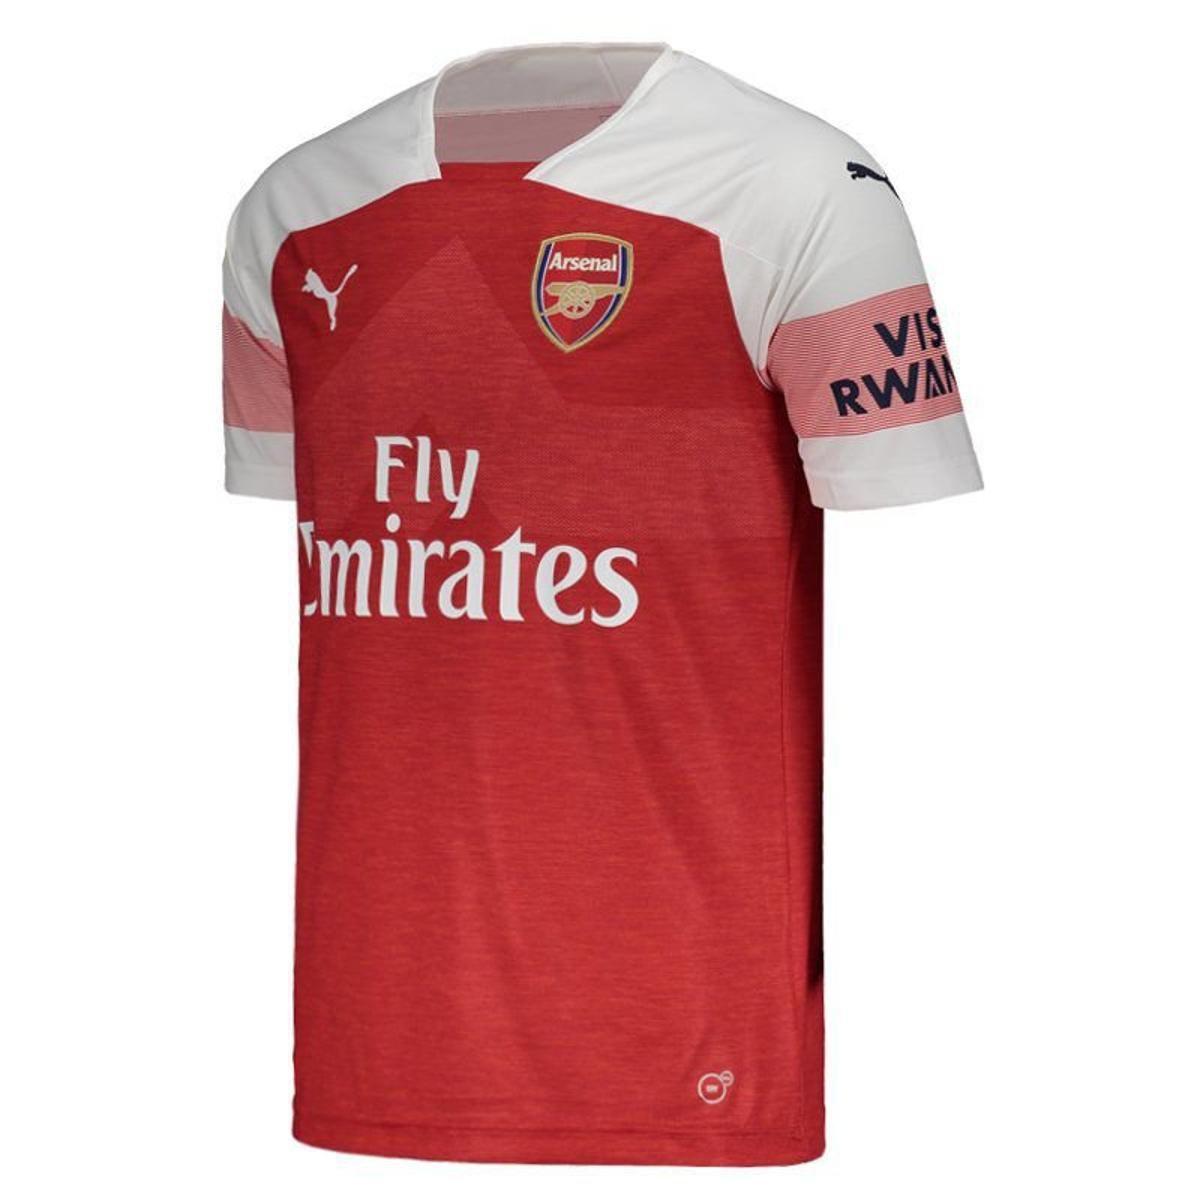 ... Patch Jersey - FutFanatics 56be0a053ea7d3  Camisa Puma Arsenal Home 2019  Masculina - Compre Agora Netshoes 6e0eb4366241a4 ... 85a4bff5aa6fb